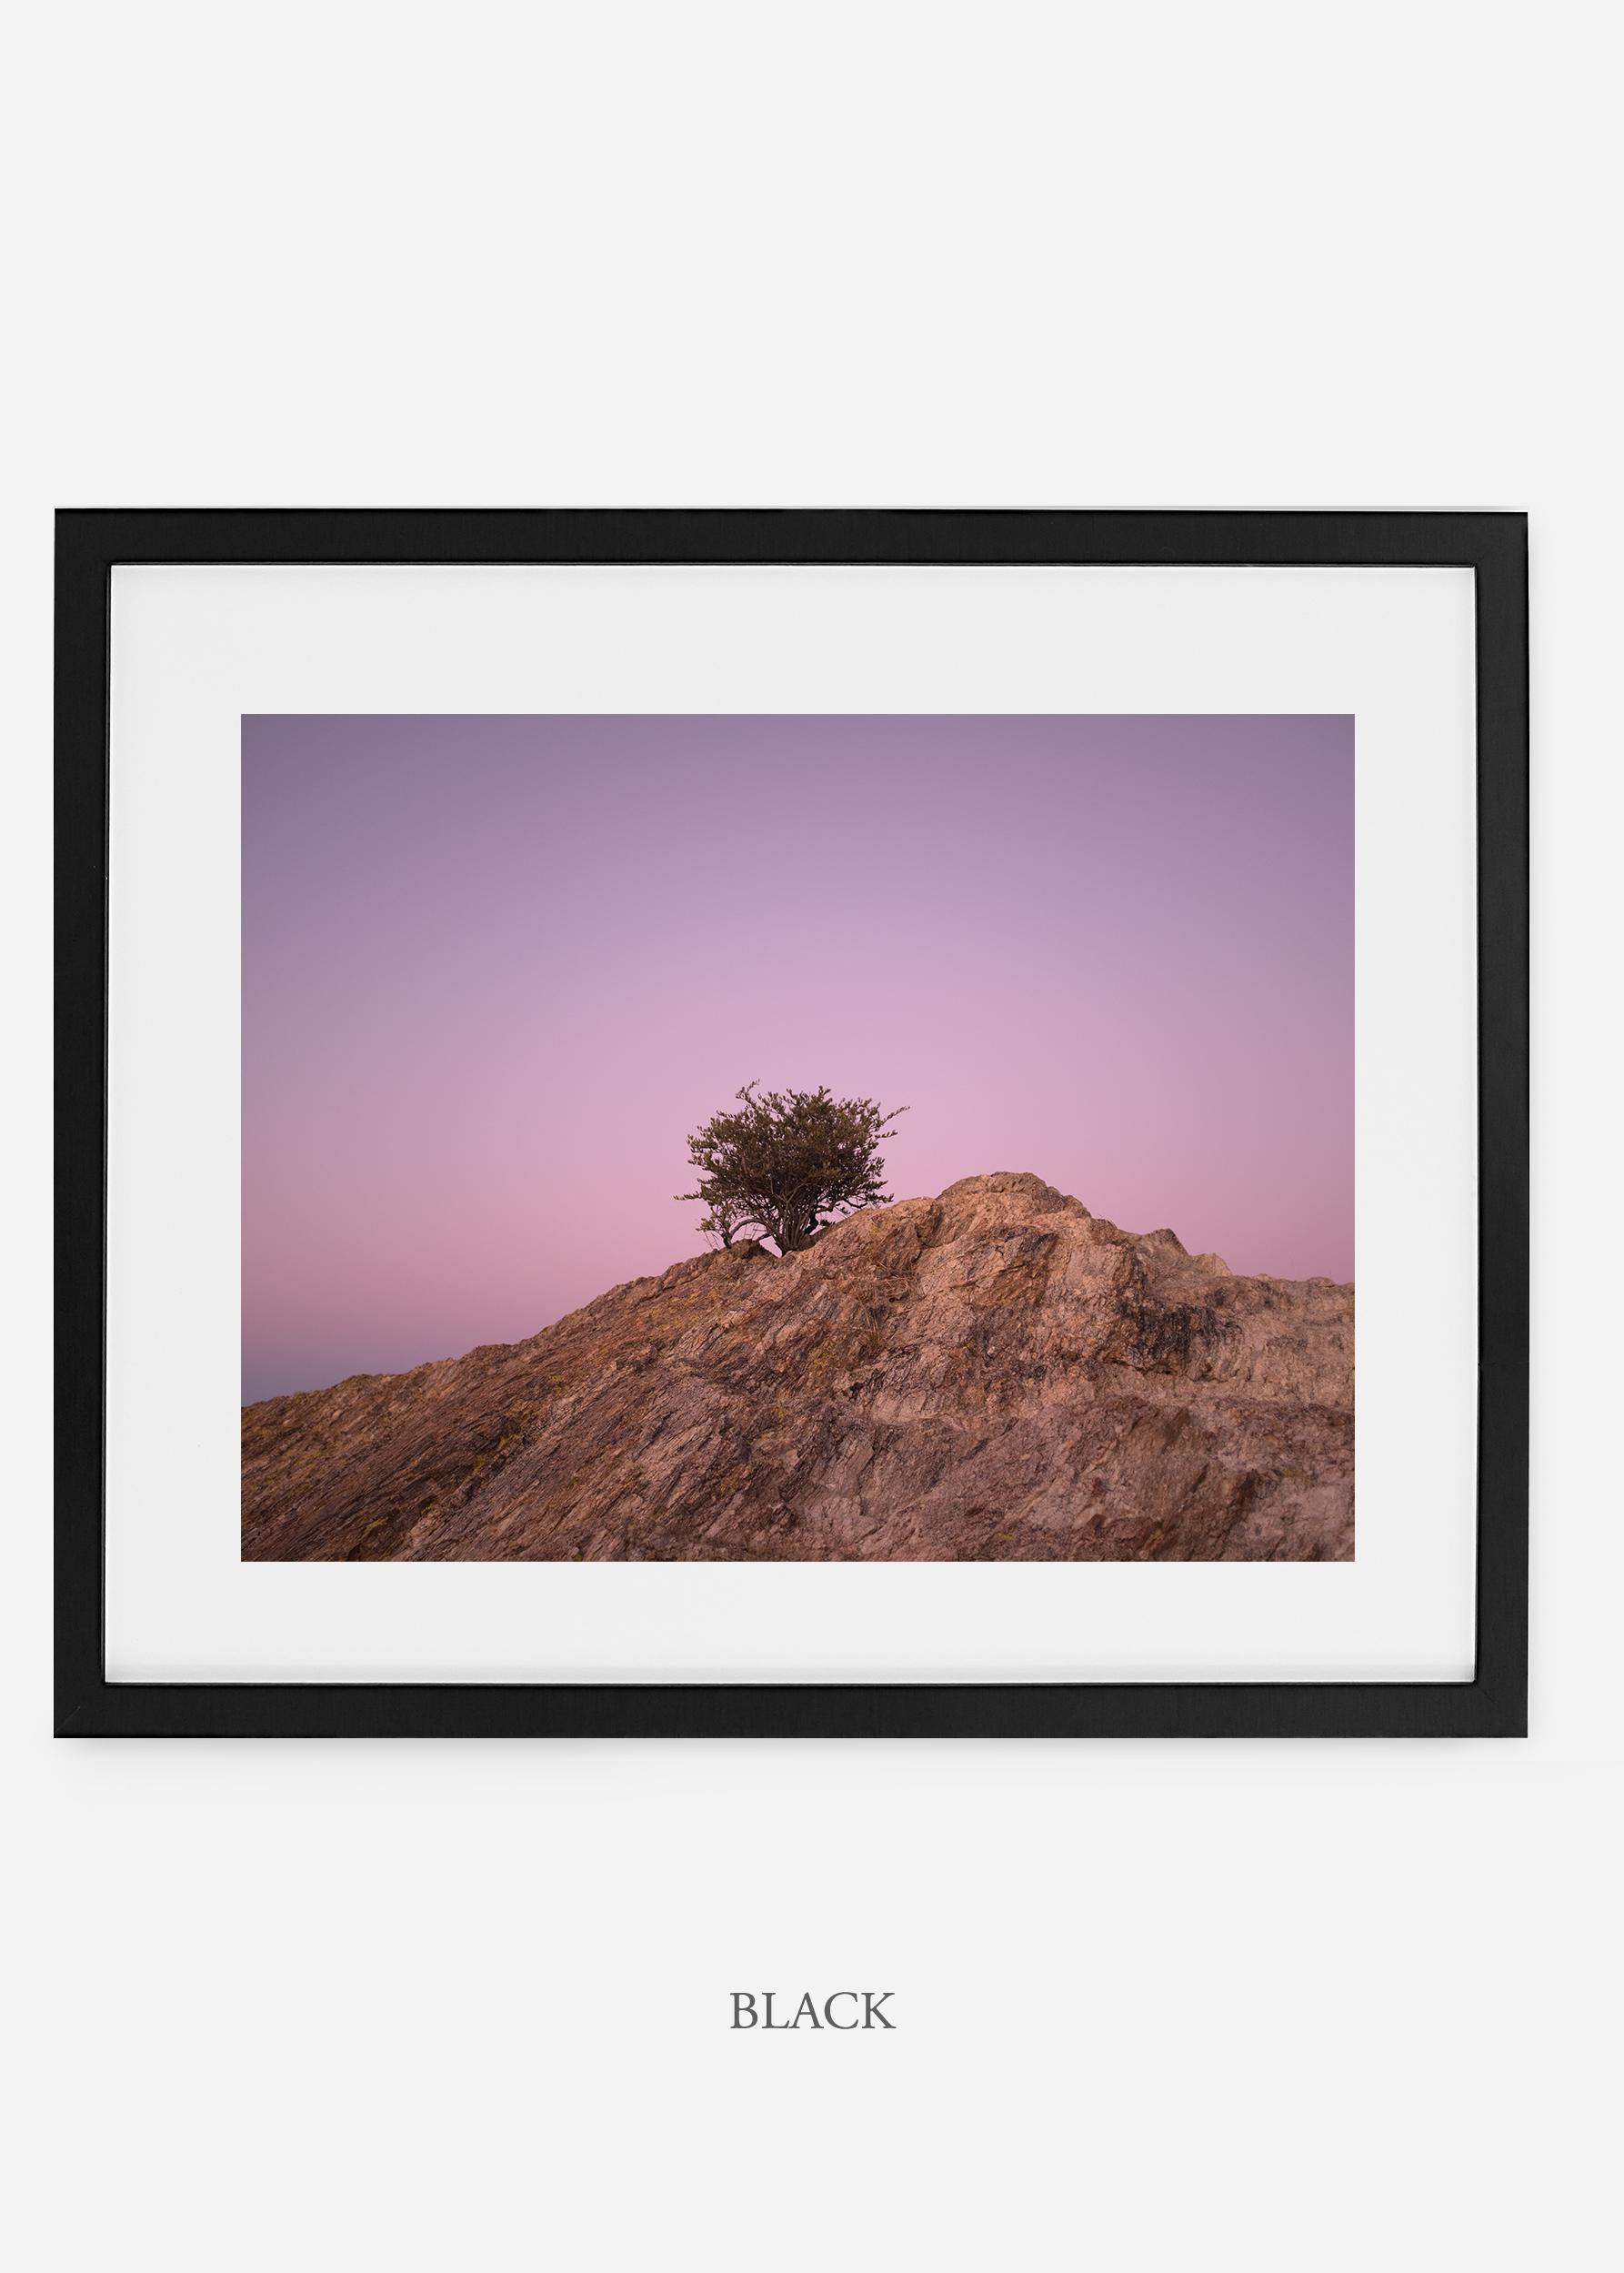 blackframe-saguaroNo.11-wildercalifornia-art-wallart-cactusprint-homedecor-prints-arizona-botanical-artwork-interiordesign.jpg